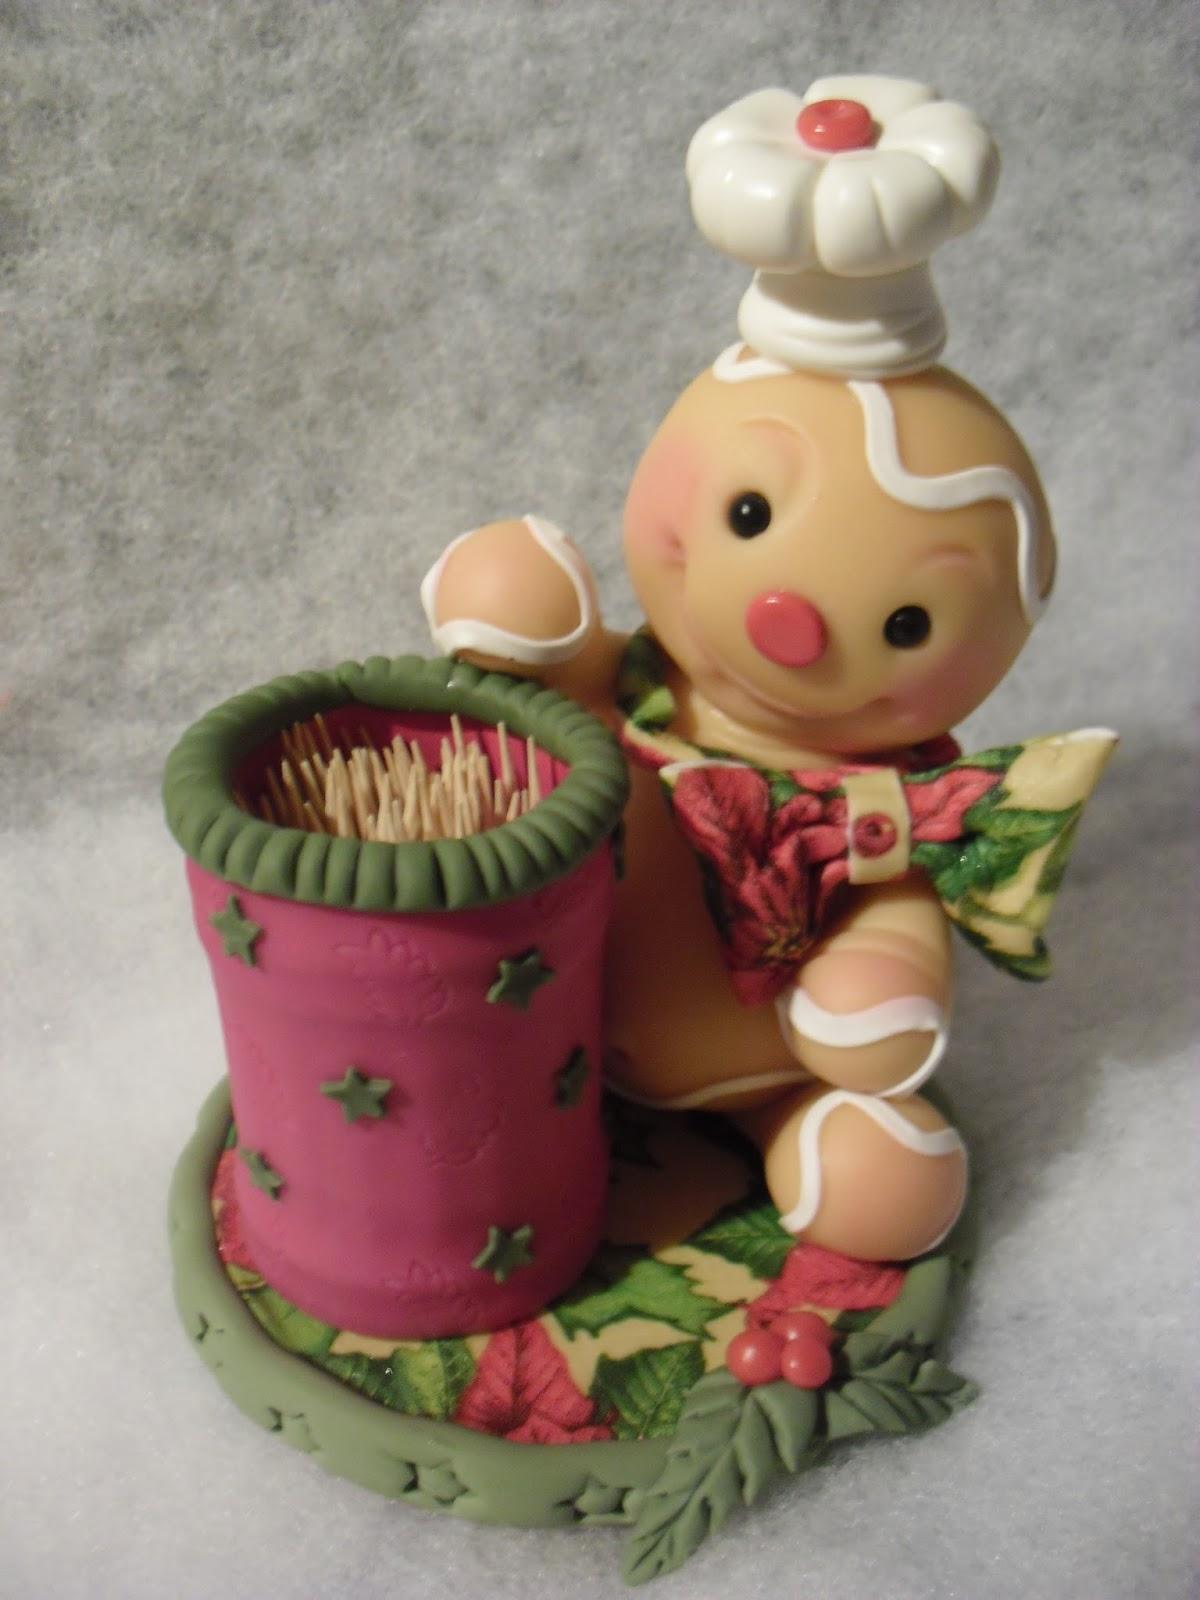 Cyri porcelana fria galleta de jengibre for Adornos navidenos en porcelana fria utilisima